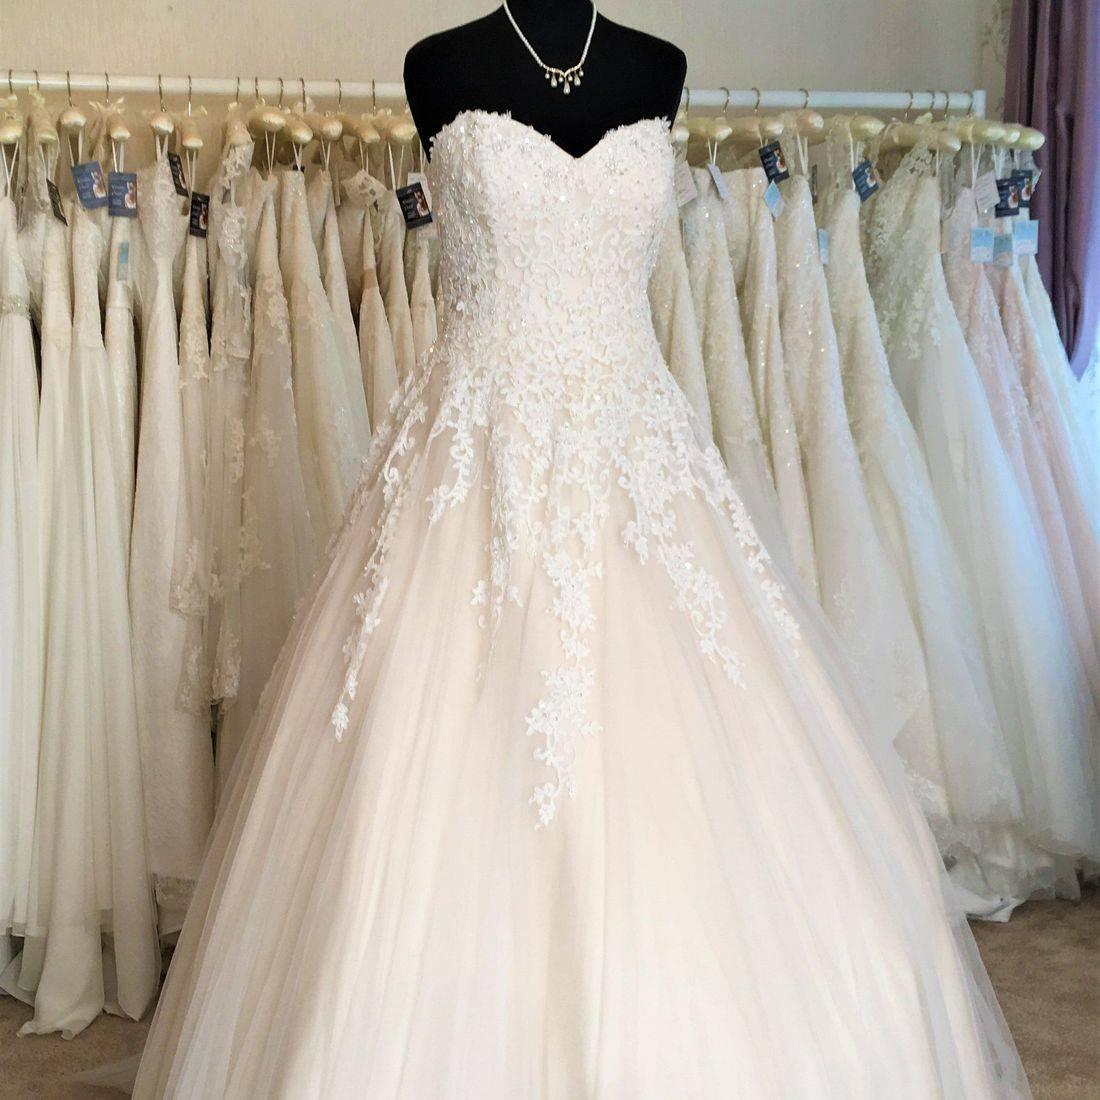 sweetheart ballgown wedding dress